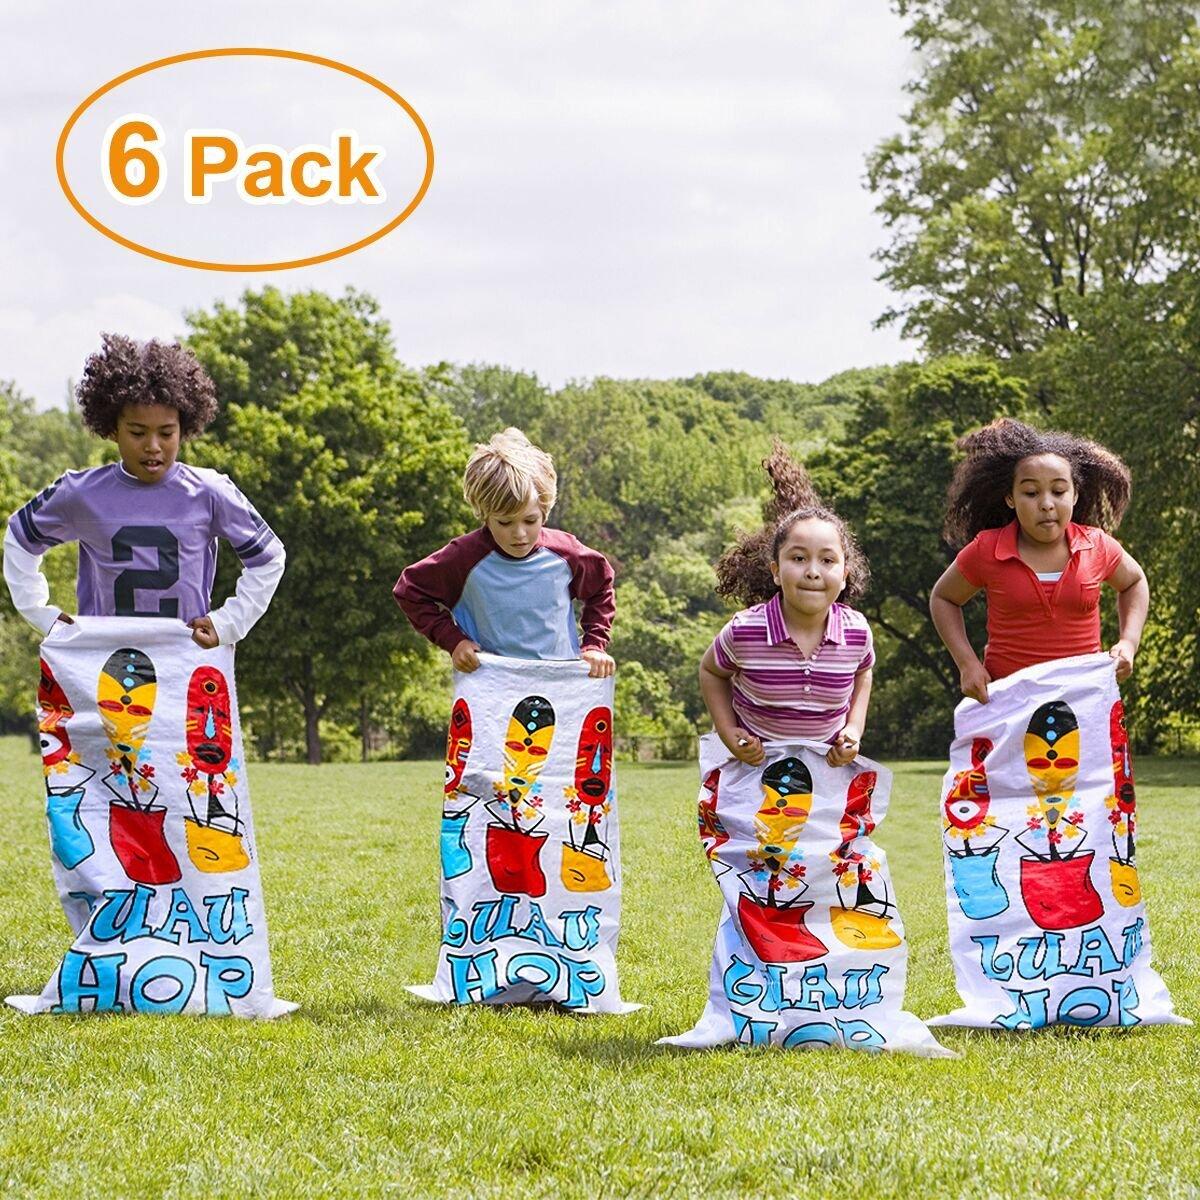 9907bbd6603e Amazon.com: iBaseToy Potato Sack Race Bags Potato Sacks for Races Luau  Party Games for Kids Outdoor Games Birthday Party Game (6 Pack, 24